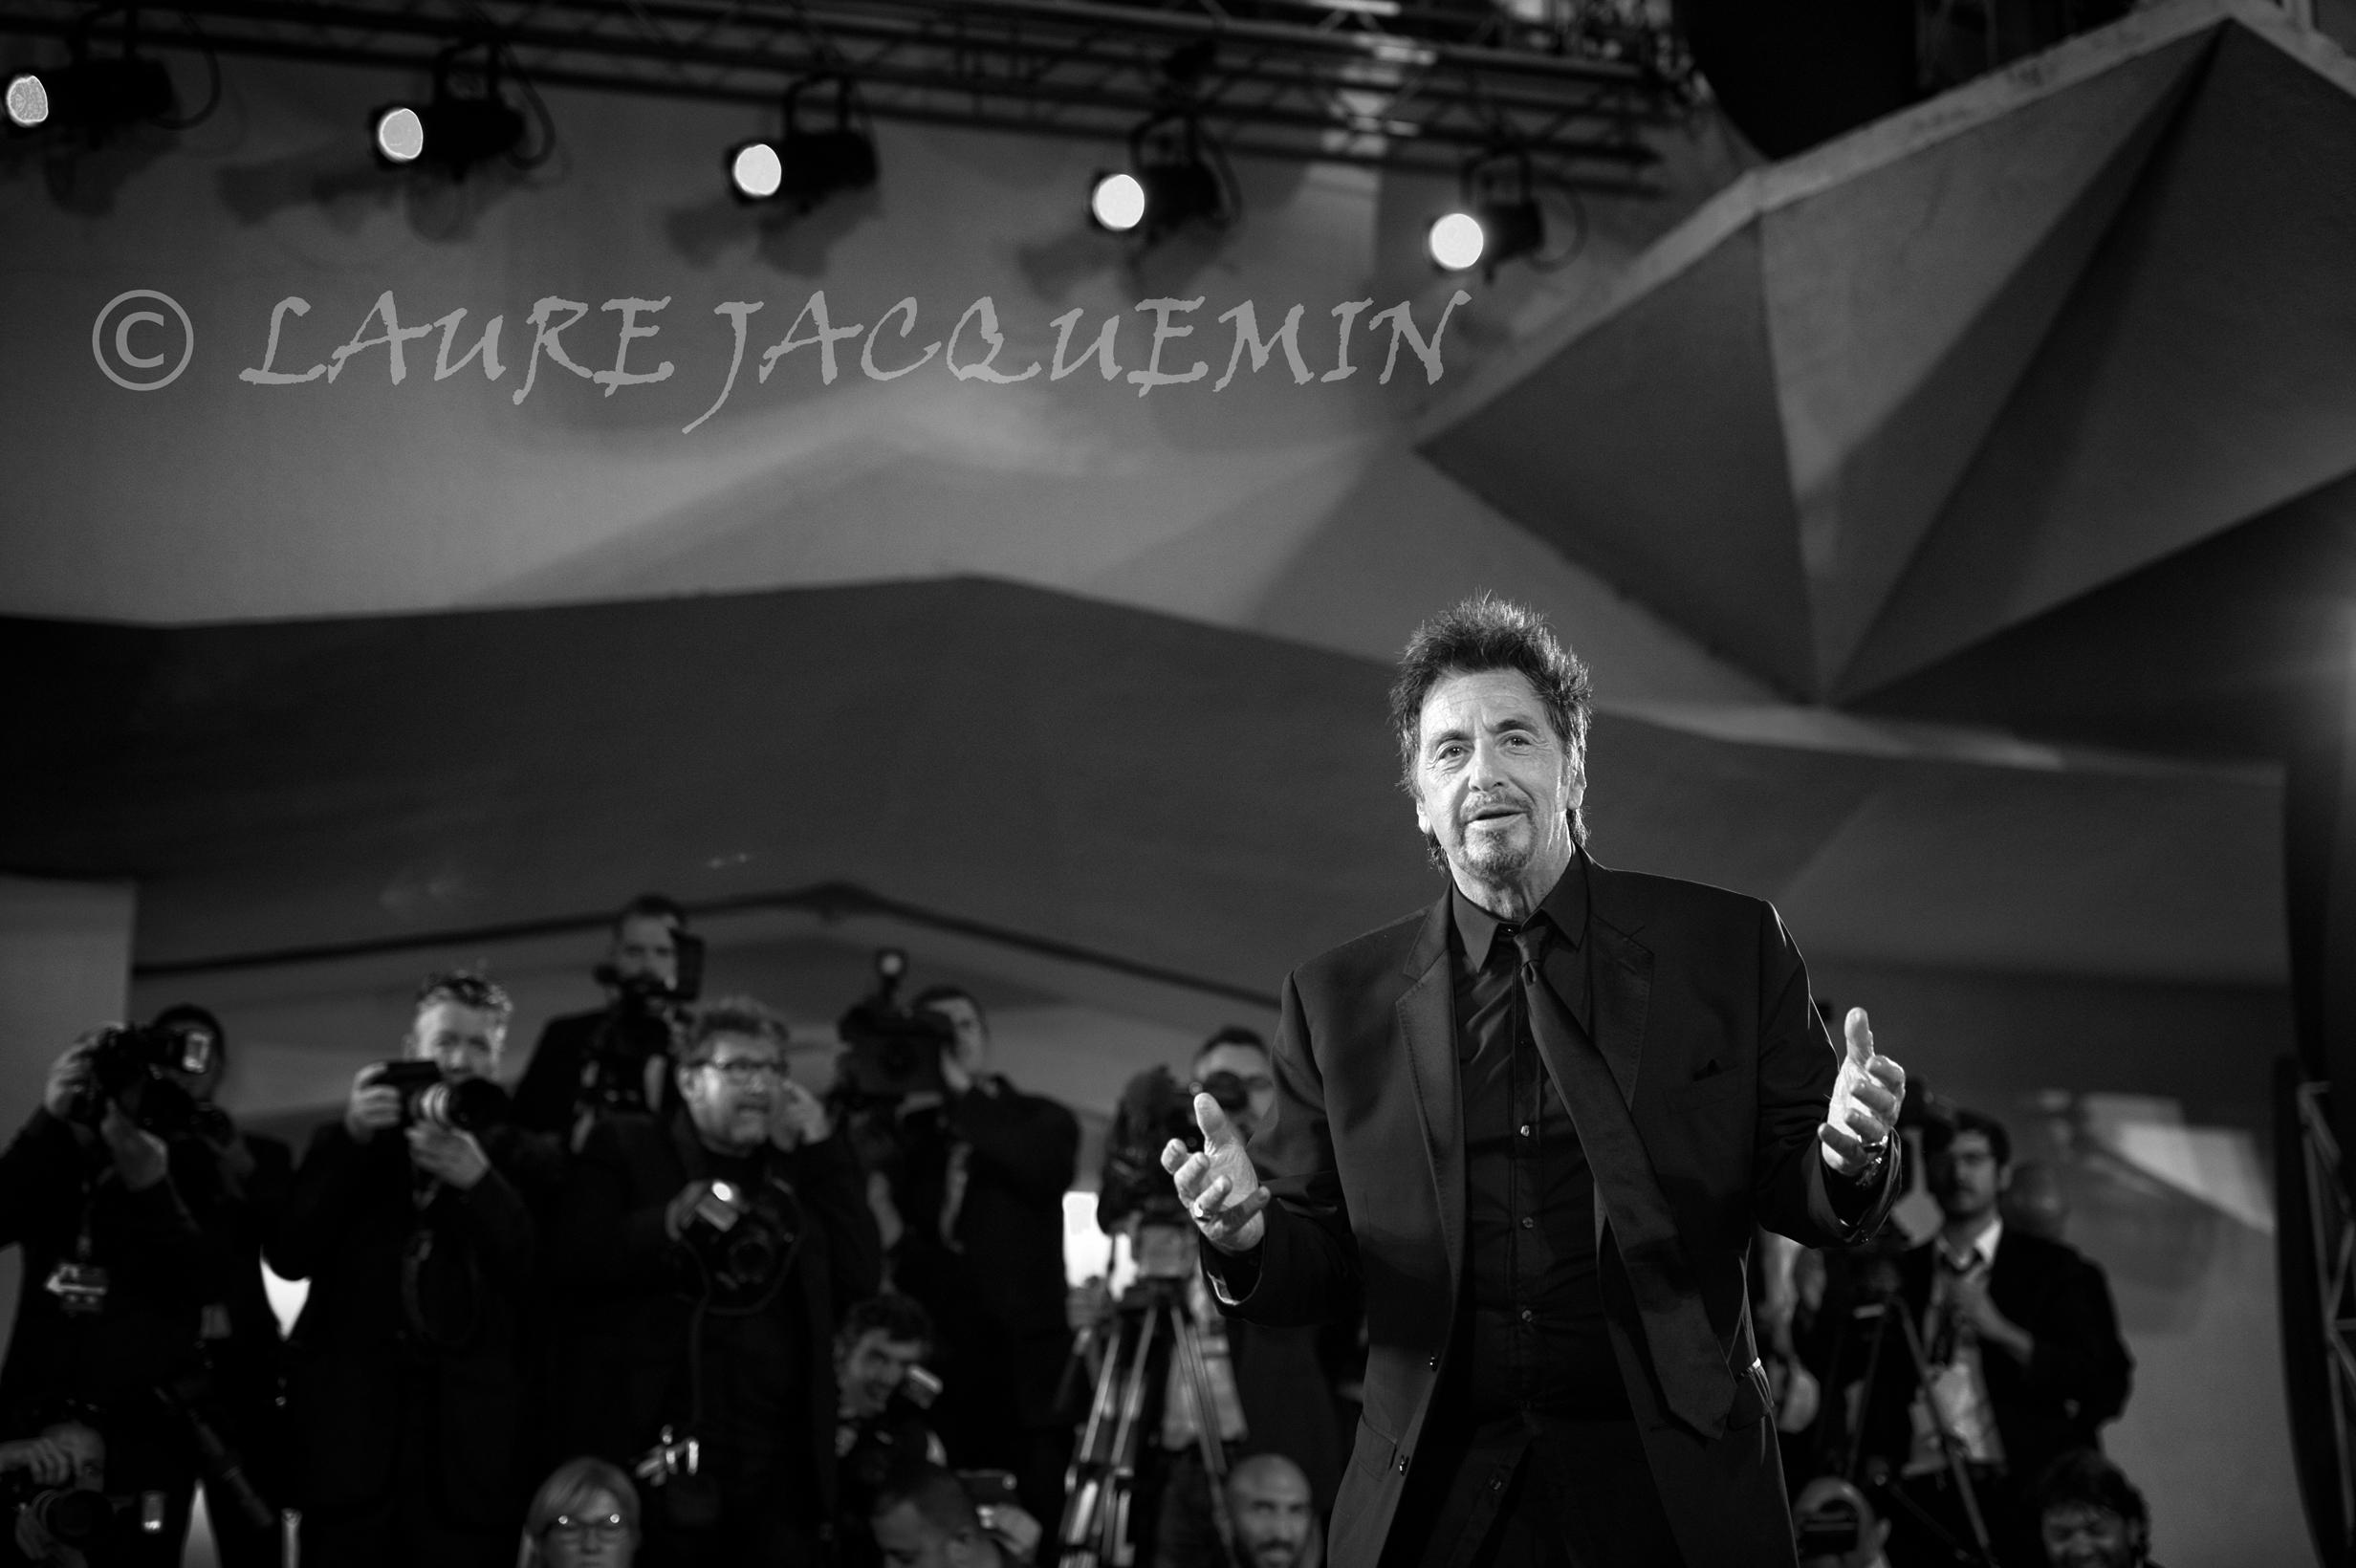 venice film festival venice laure jacquemin (20).jpg